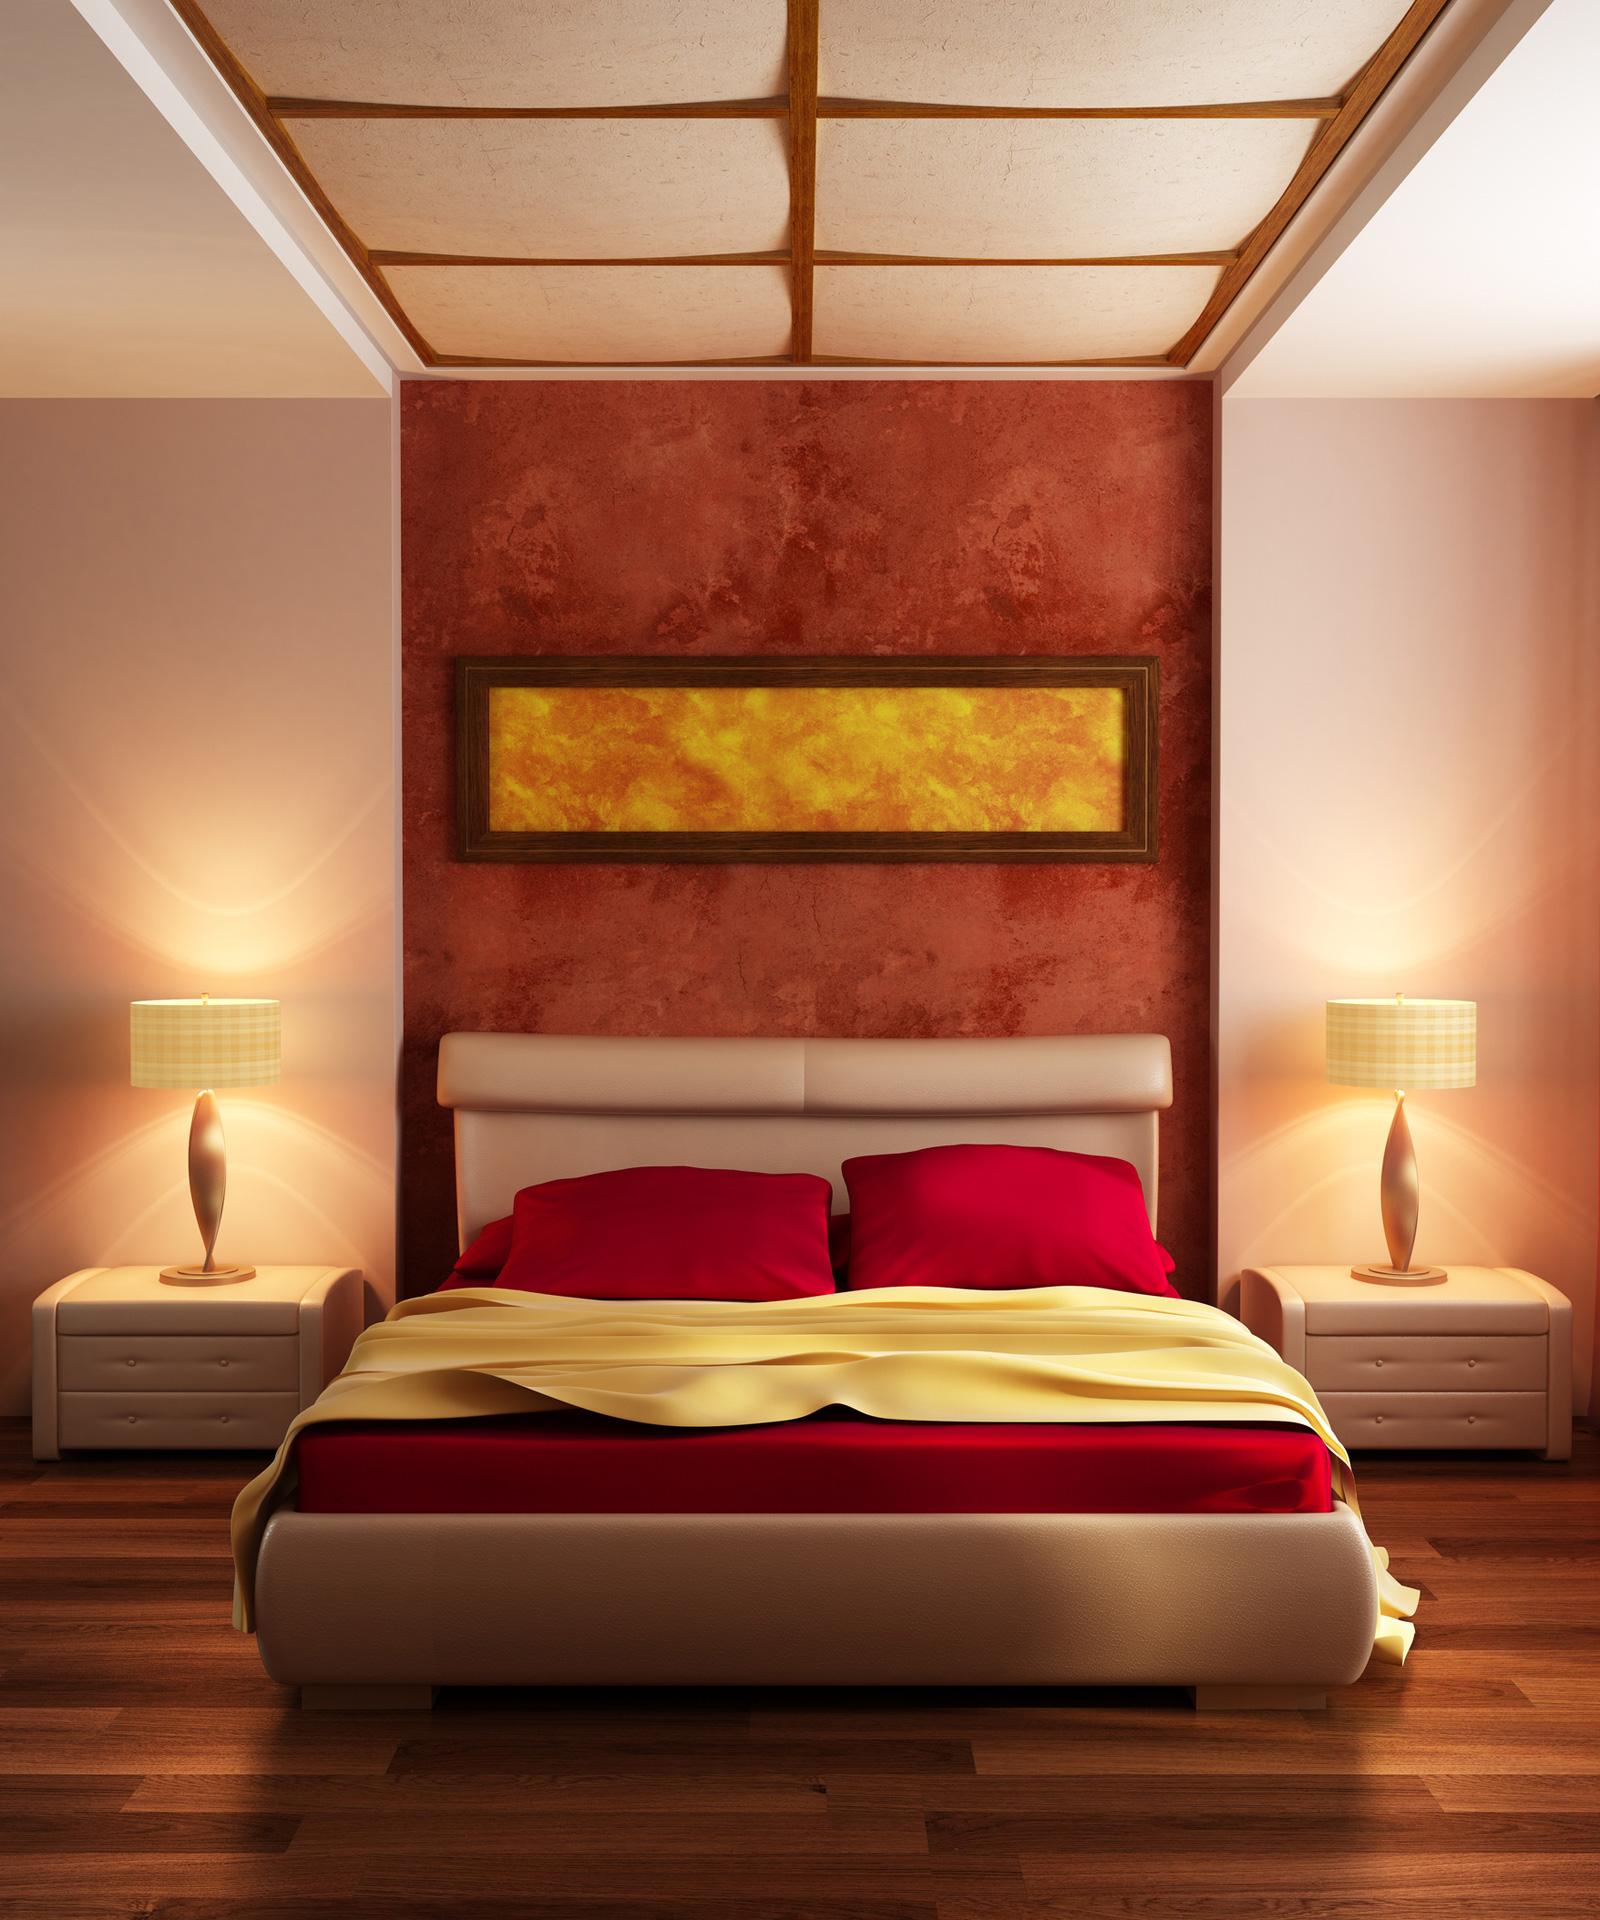 bedrooms colors design photo - 1